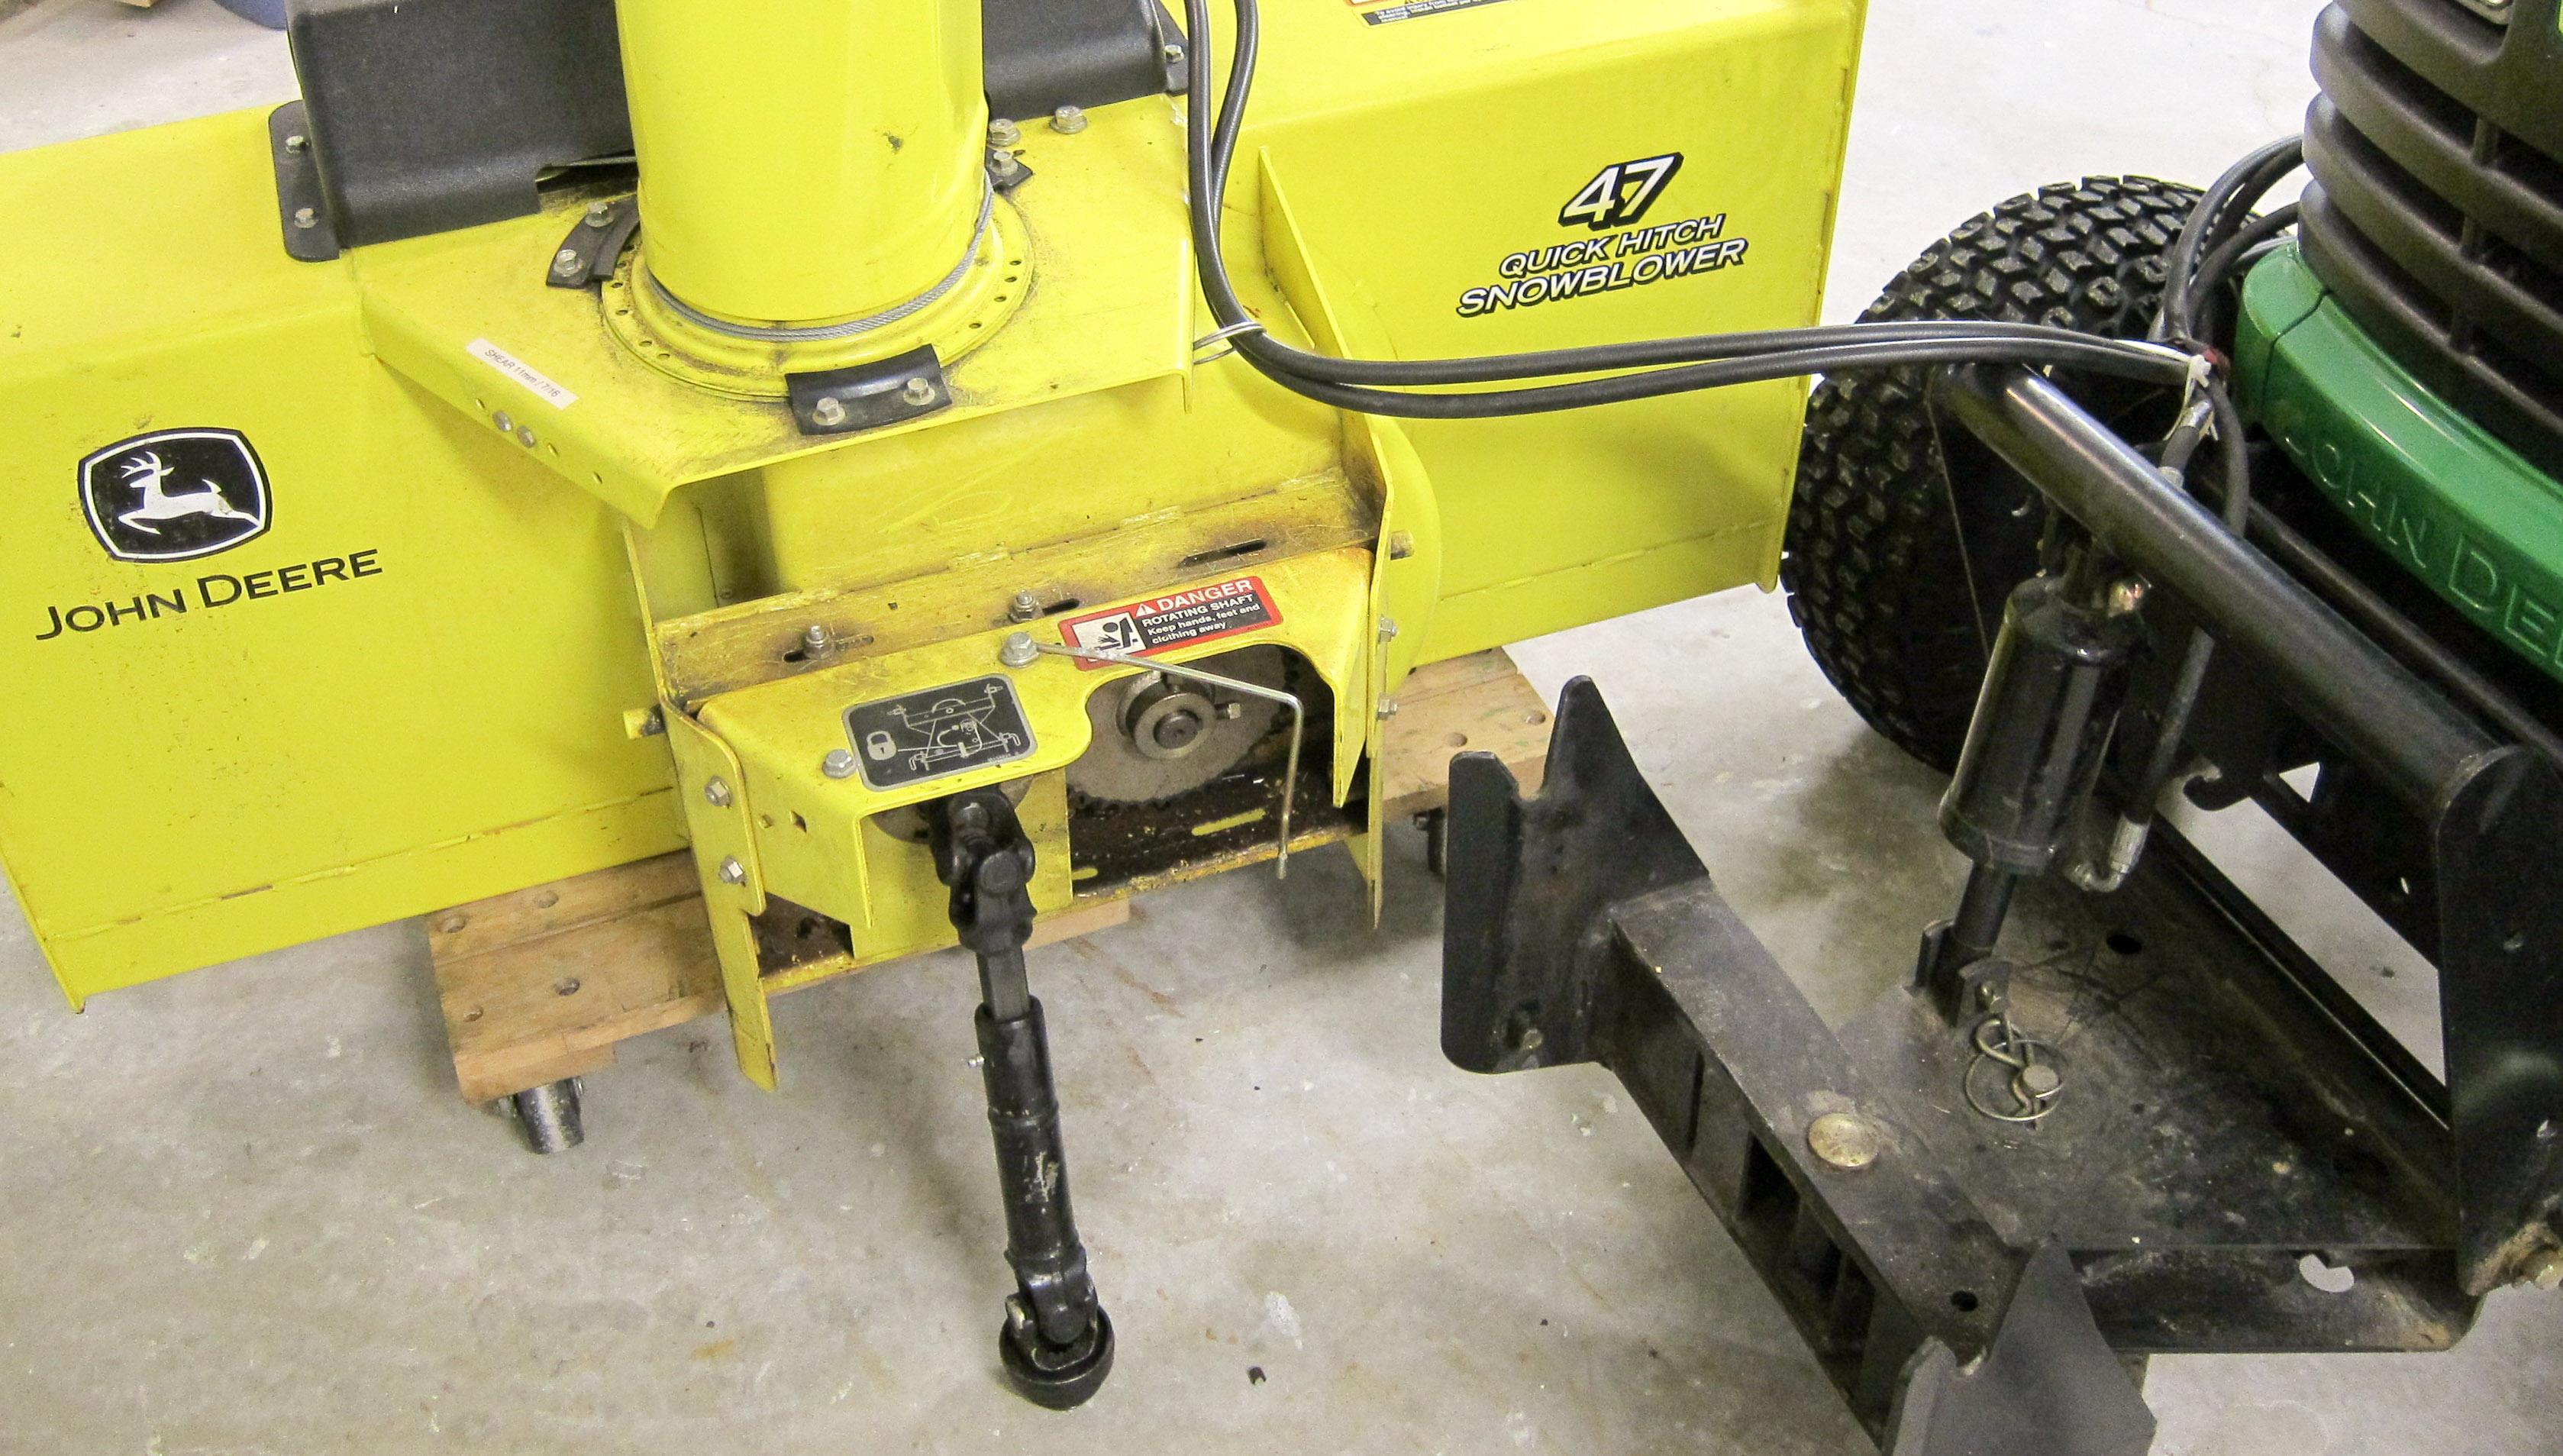 John Deere 47 inch snowblower manual